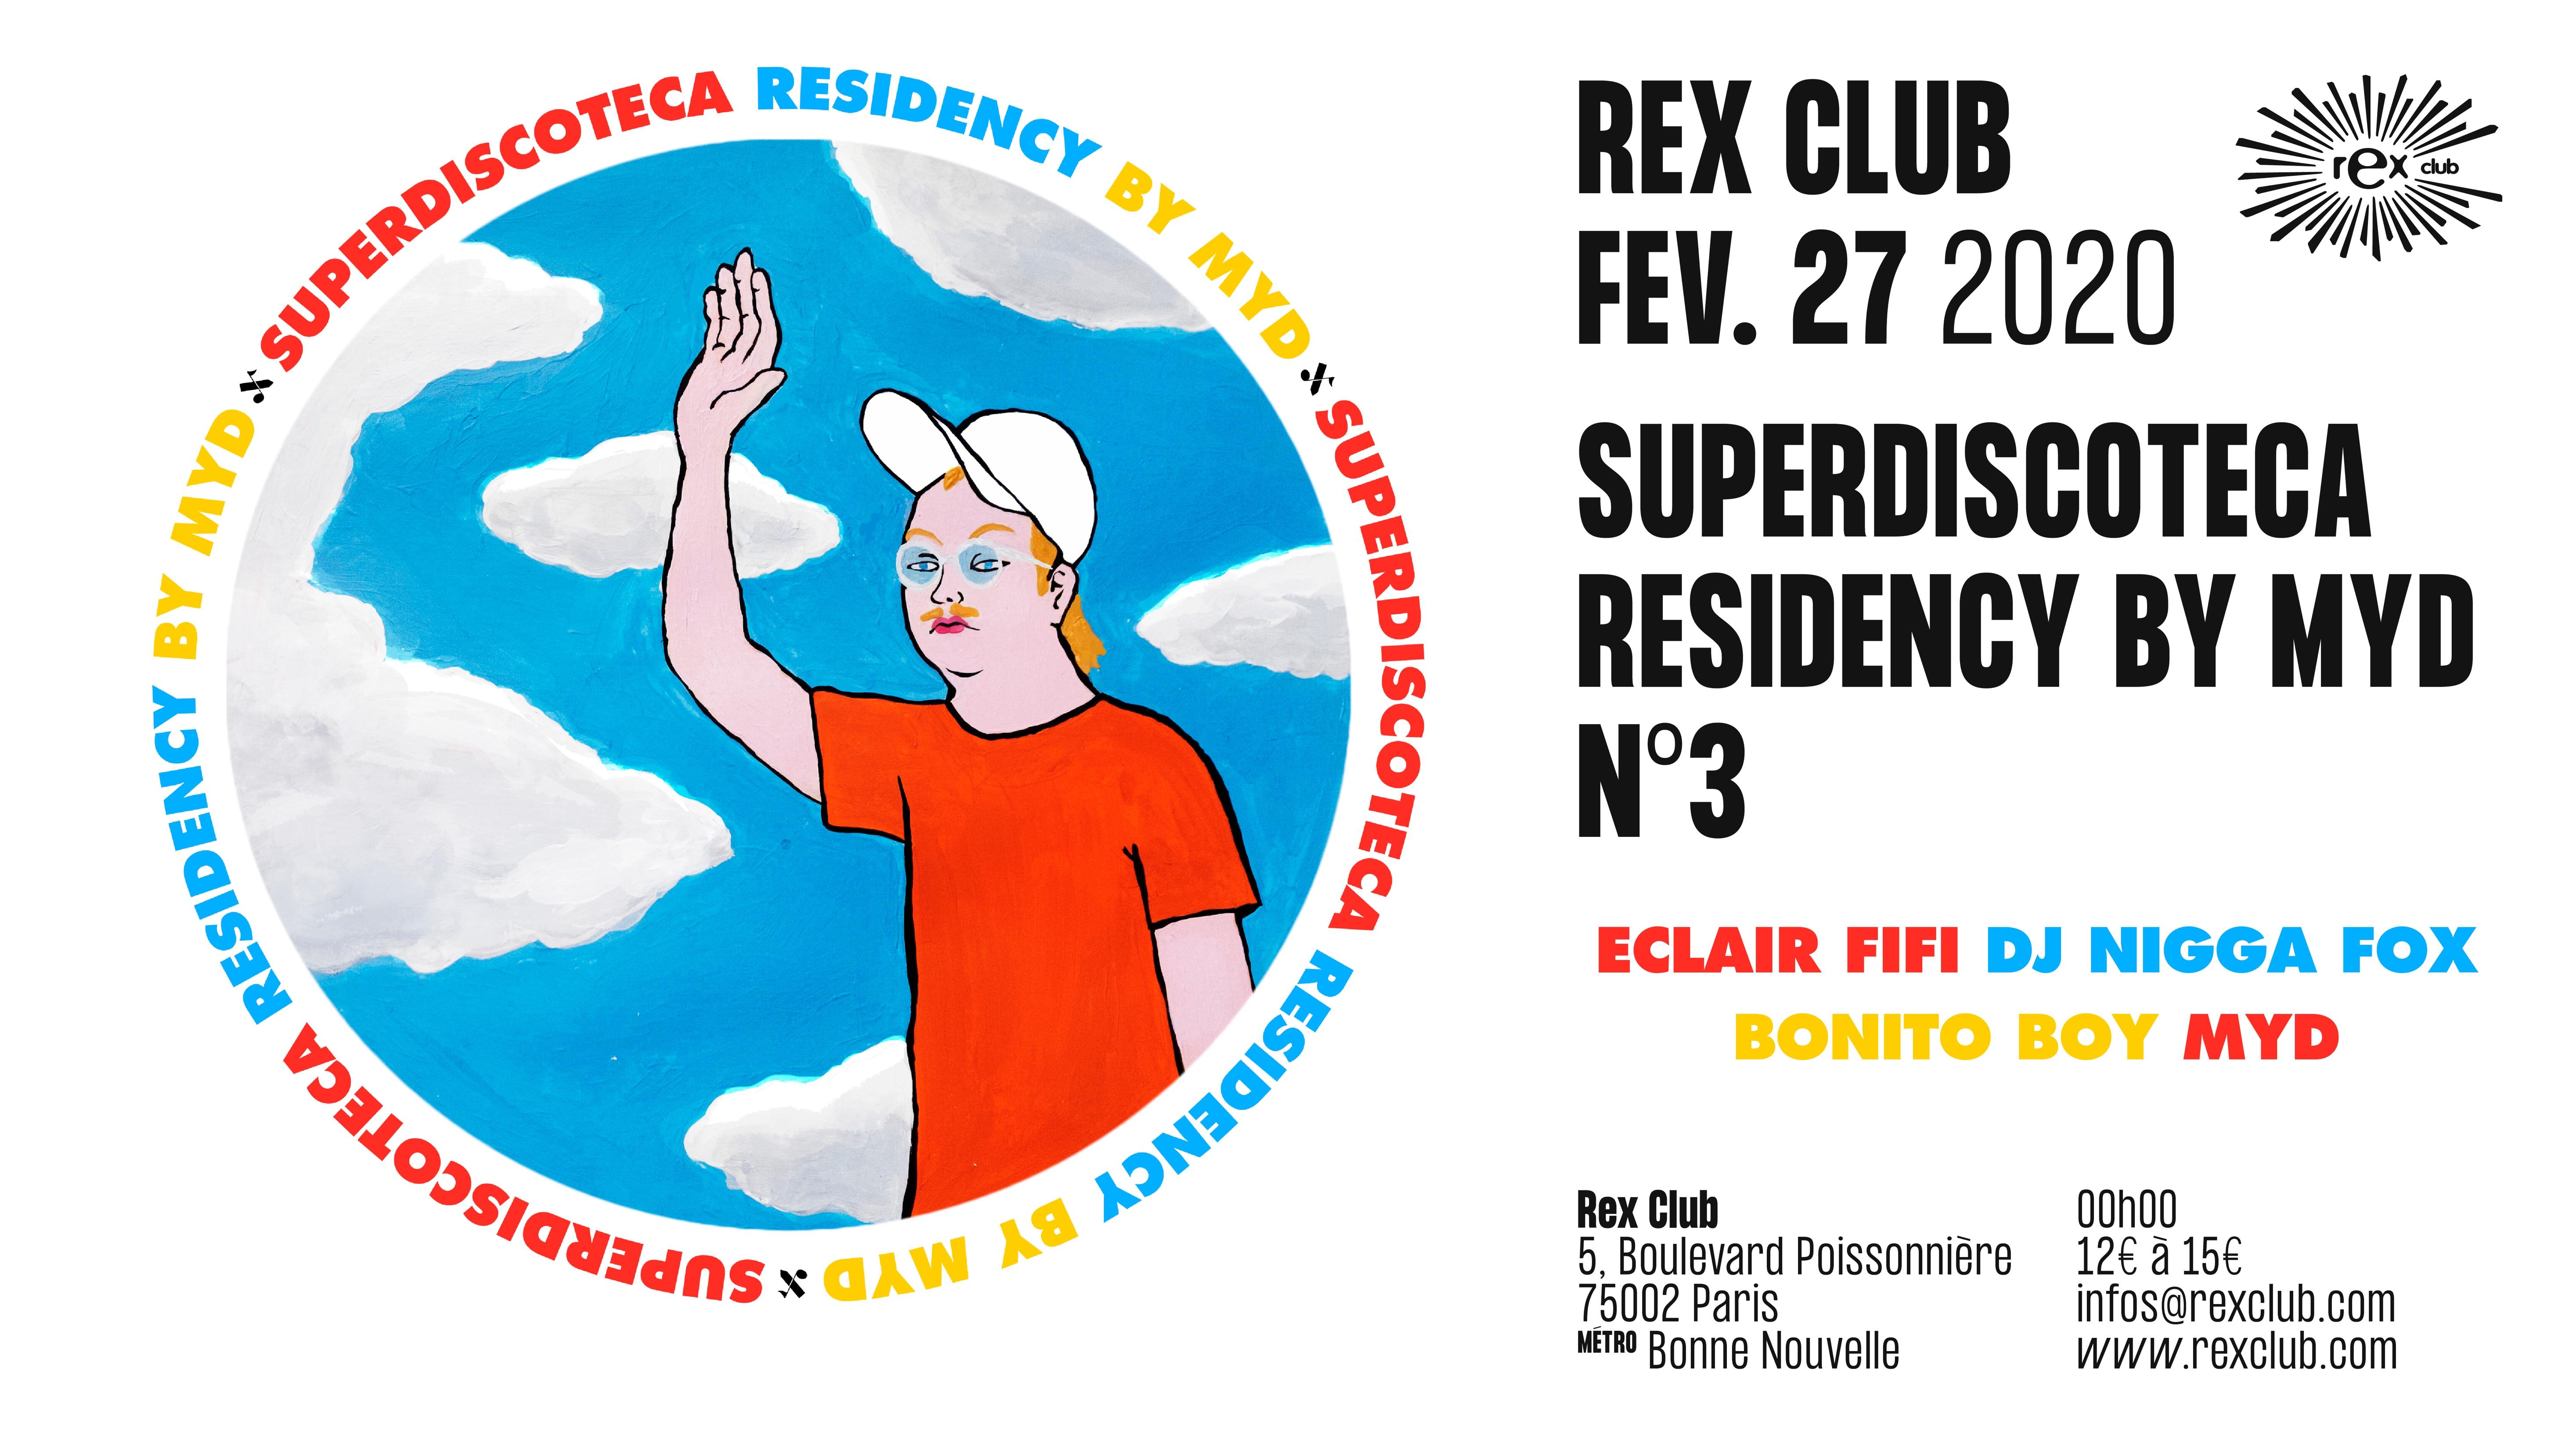 Superdiscoteca Residency by Myd (3)